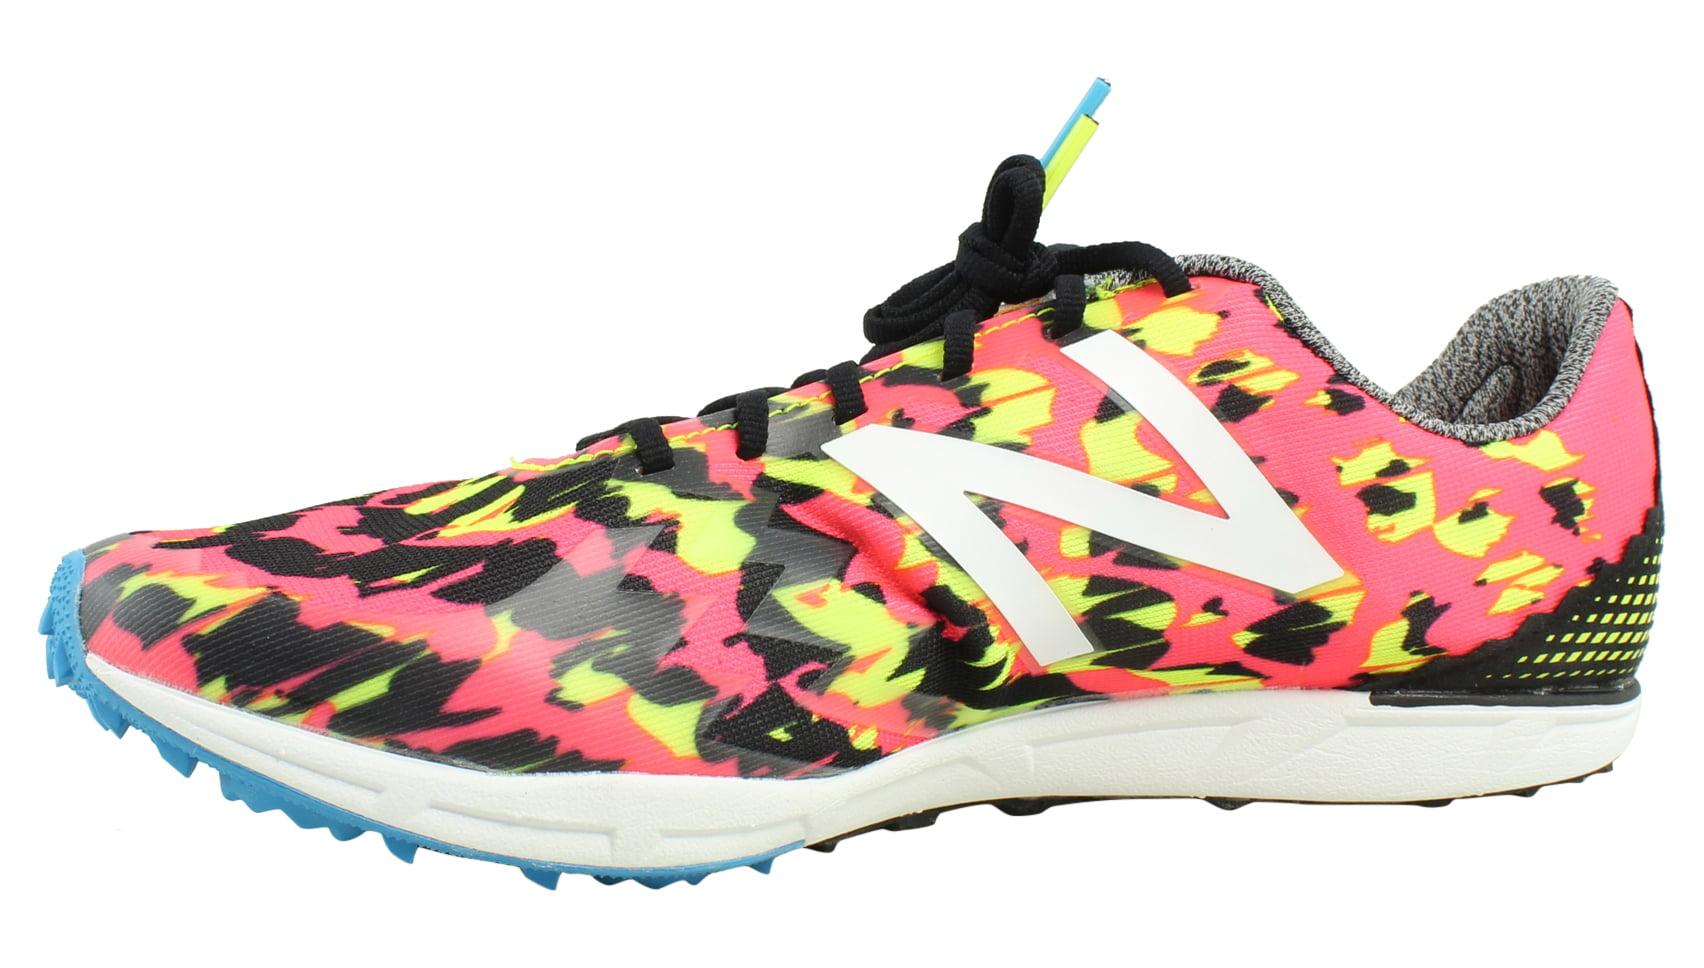 New New Balance Womens Wxcs700v4trackspike-W Pink/Black Running Shoes Size 10